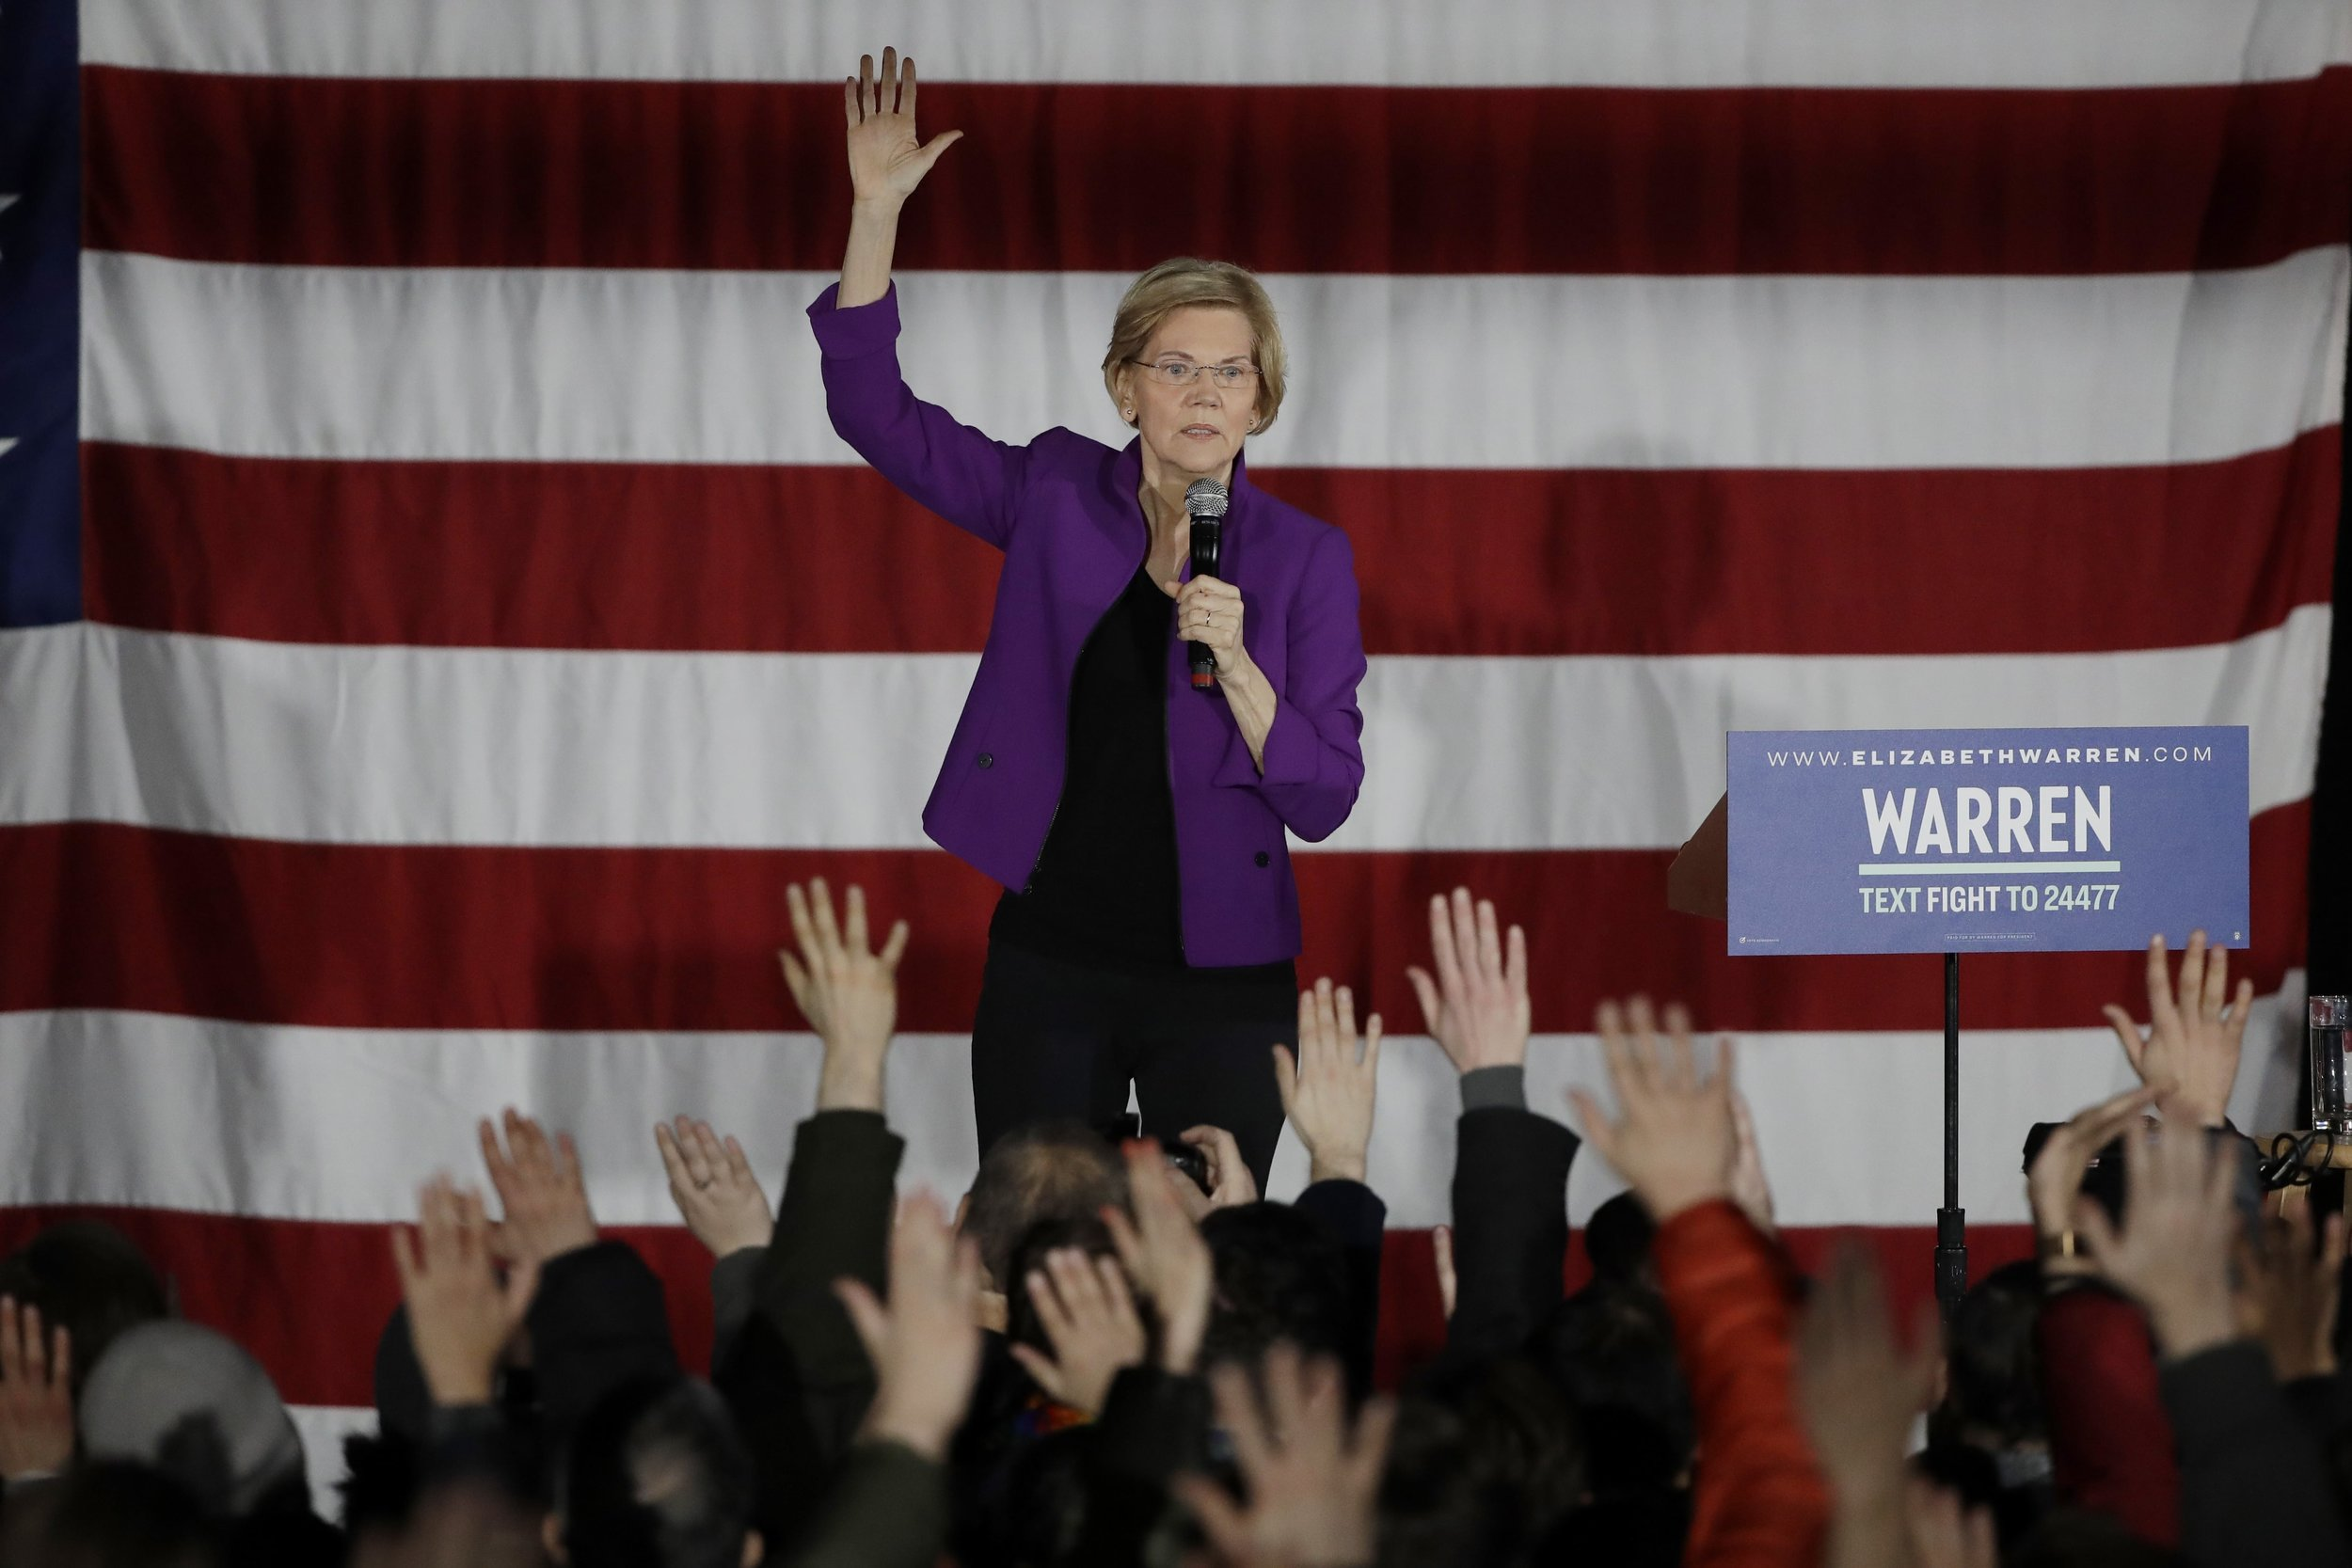 U.S. Sen. Elizabeth Warren visited Long Island City to campaign for president on Friday. AP Photo/Frank Franklin II.